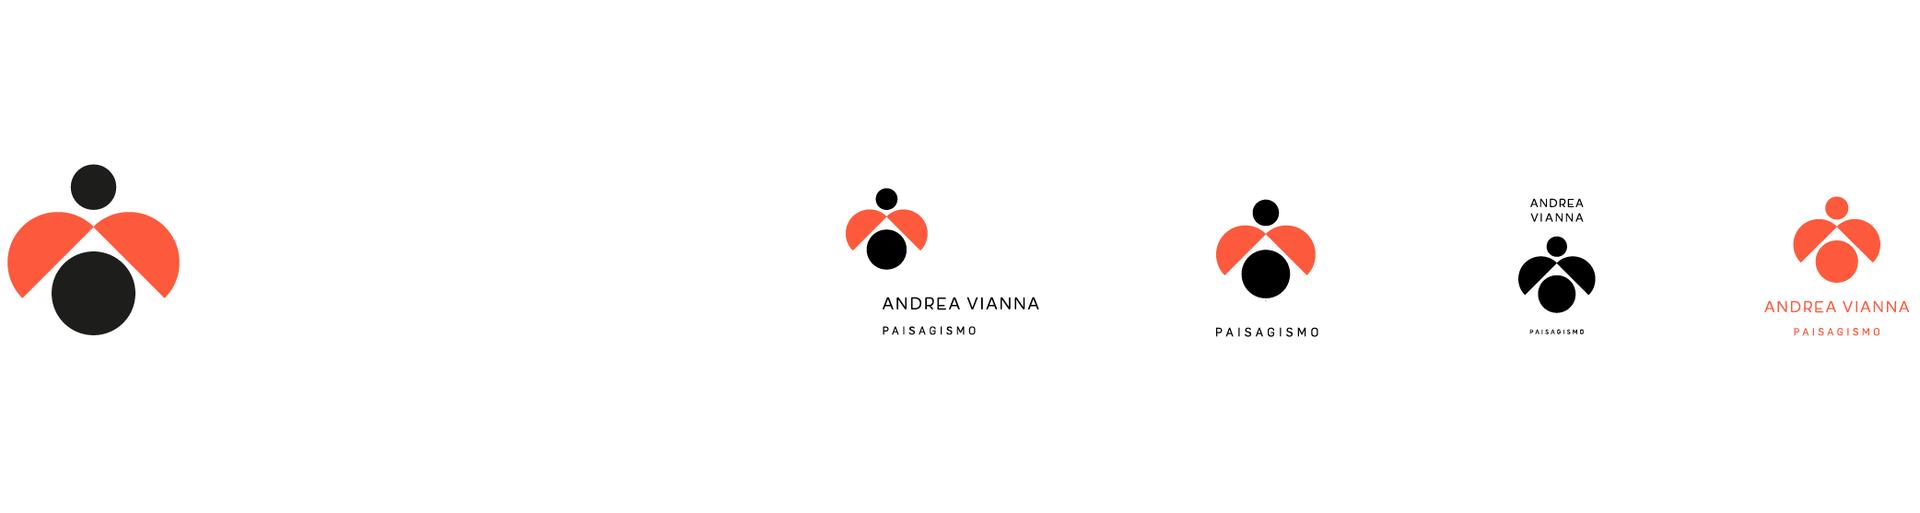 apoc_studio_gustavo_francesconi_logos_53